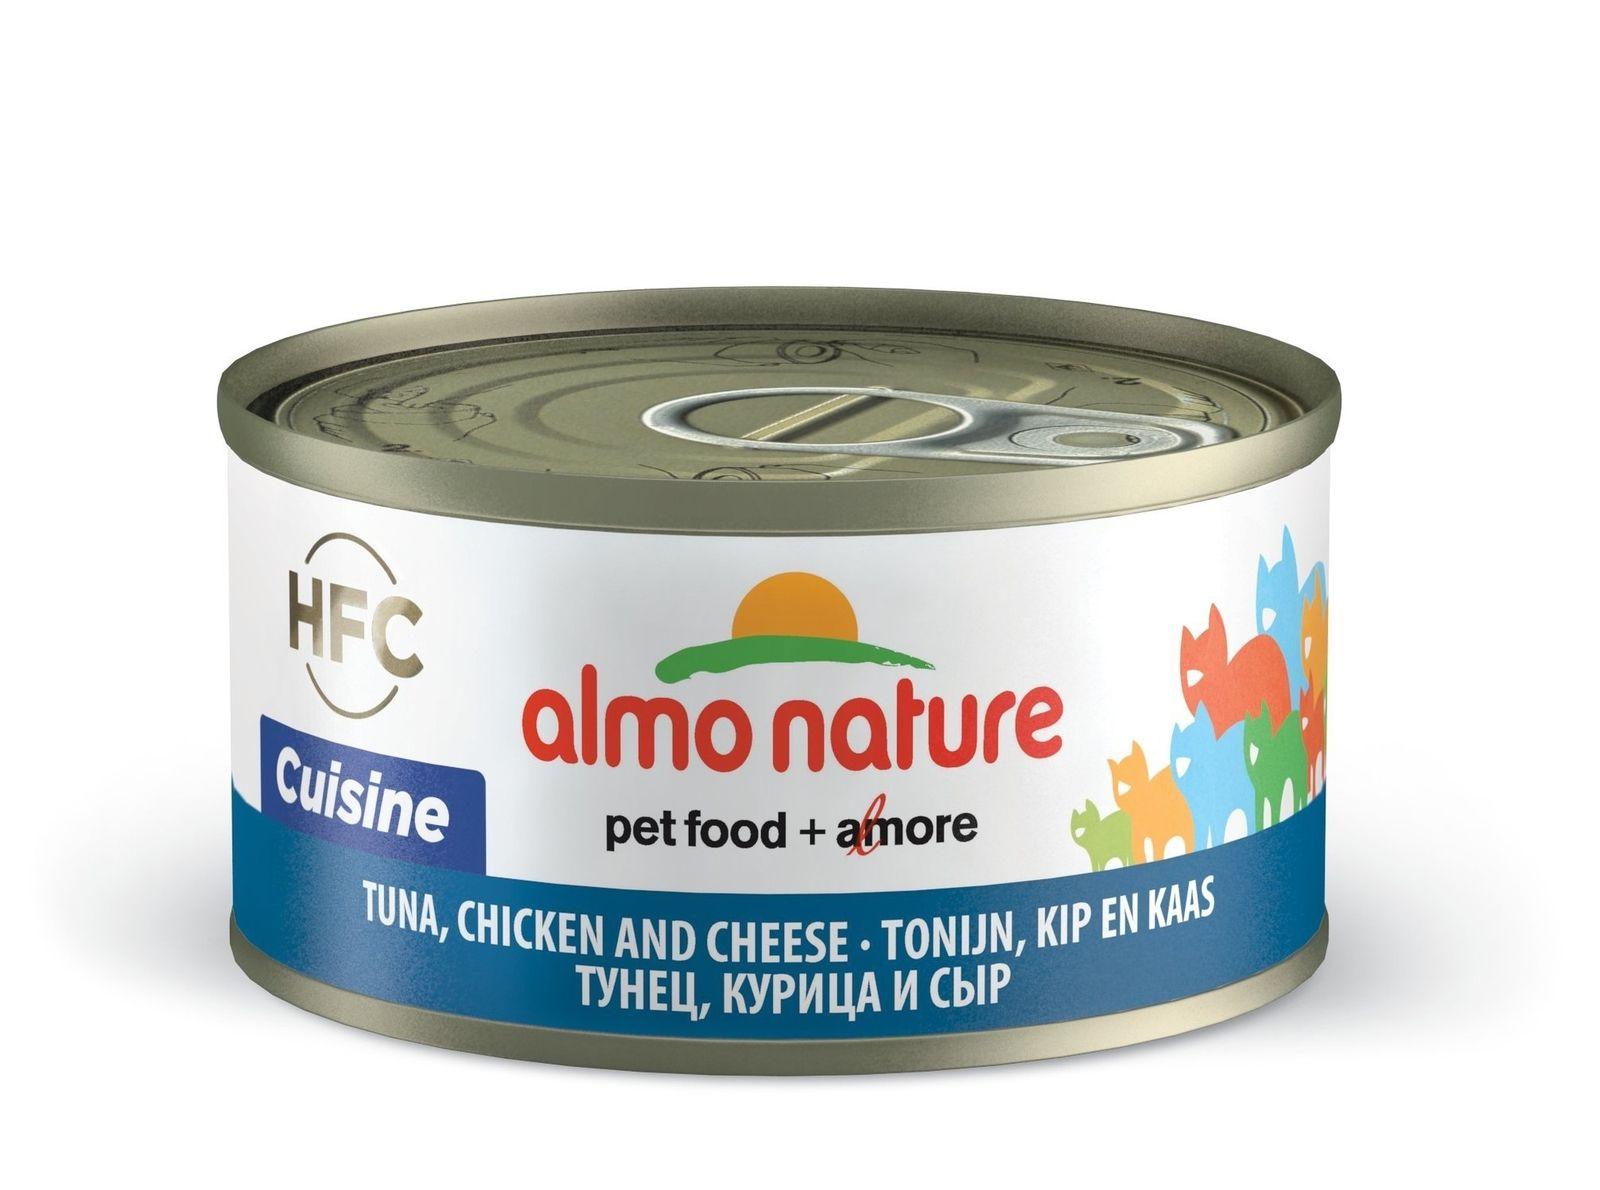 Консервы для кошек Almo Nature HFC Cuisine, курица, сыр, тунец, 70г